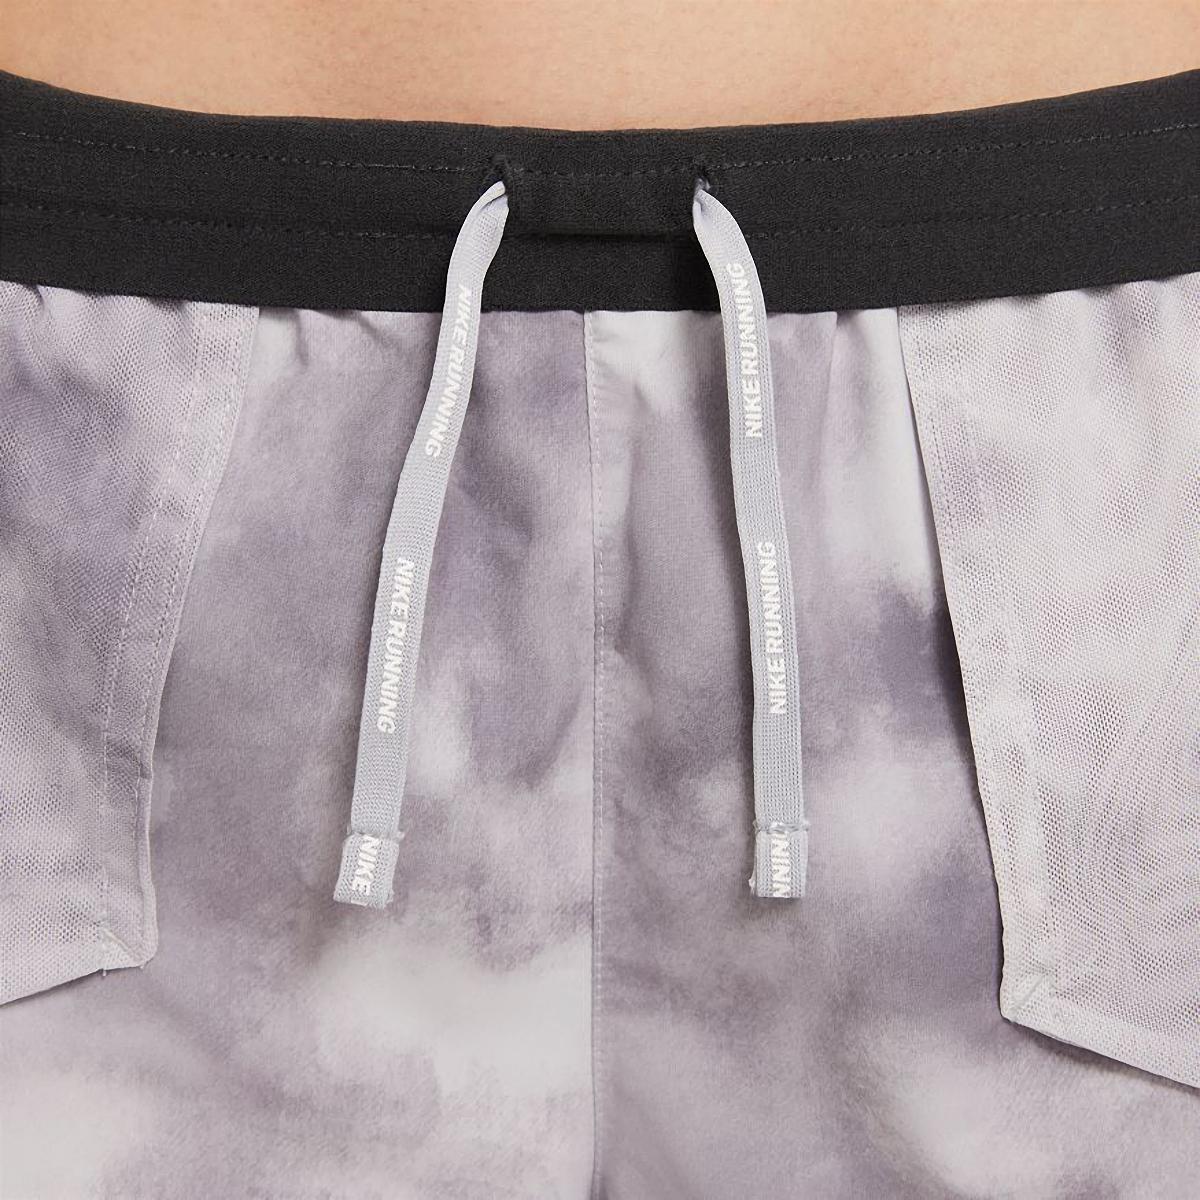 Women's Nike Tempo Luxe Icon Clash Running Shorts - Color: Light Smoke Grey/Dark Smoke Grey/Iron Grey - Size: XS, Light Smoke Grey/Dark Smoke Grey/Iron Grey, large, image 5